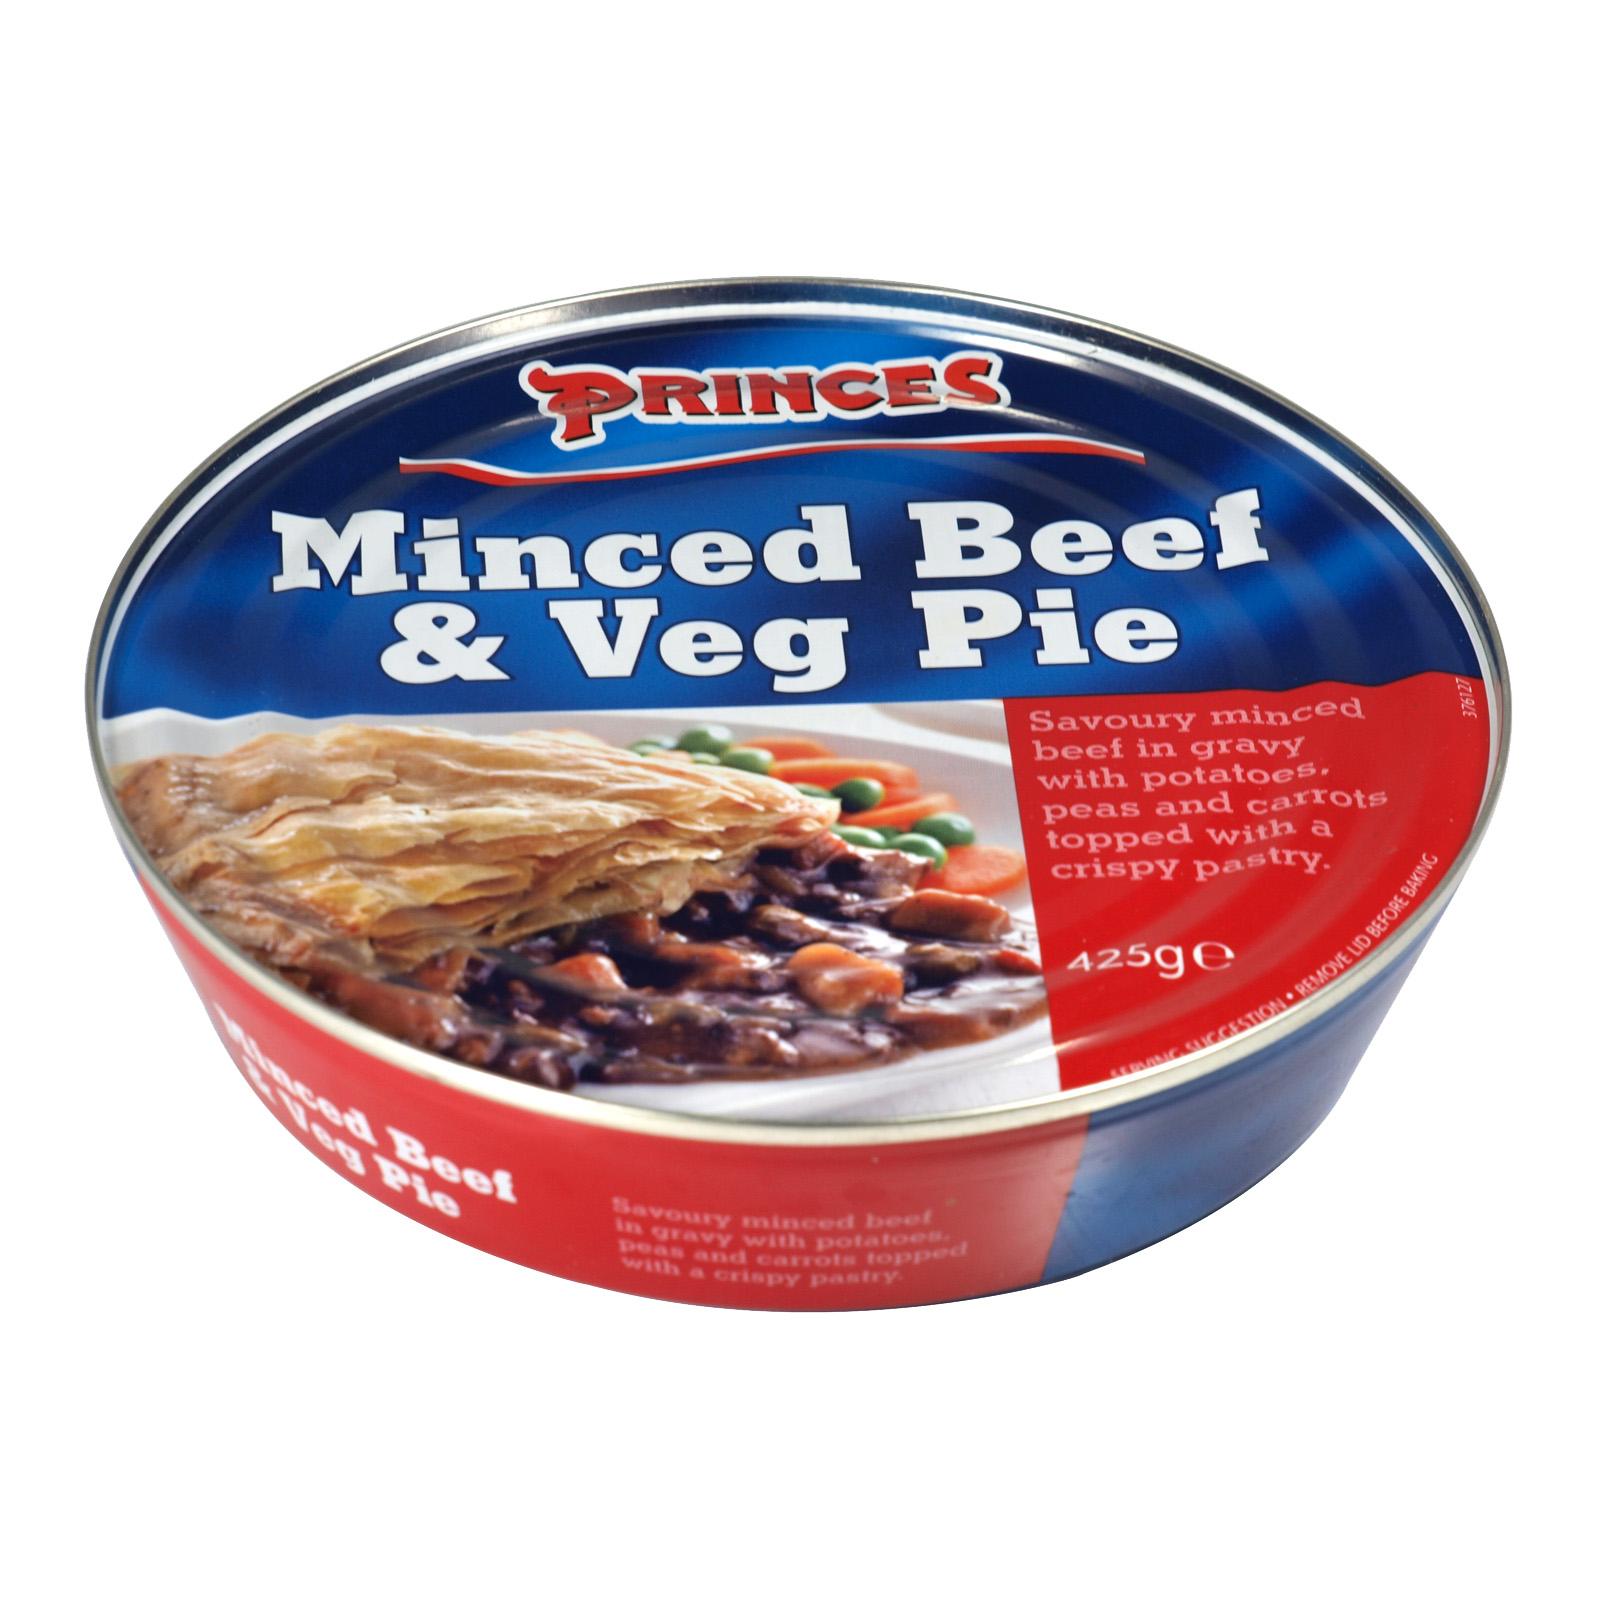 PRINCES PIE 425G MINCED BEEF+VEGETABLE PIE X6